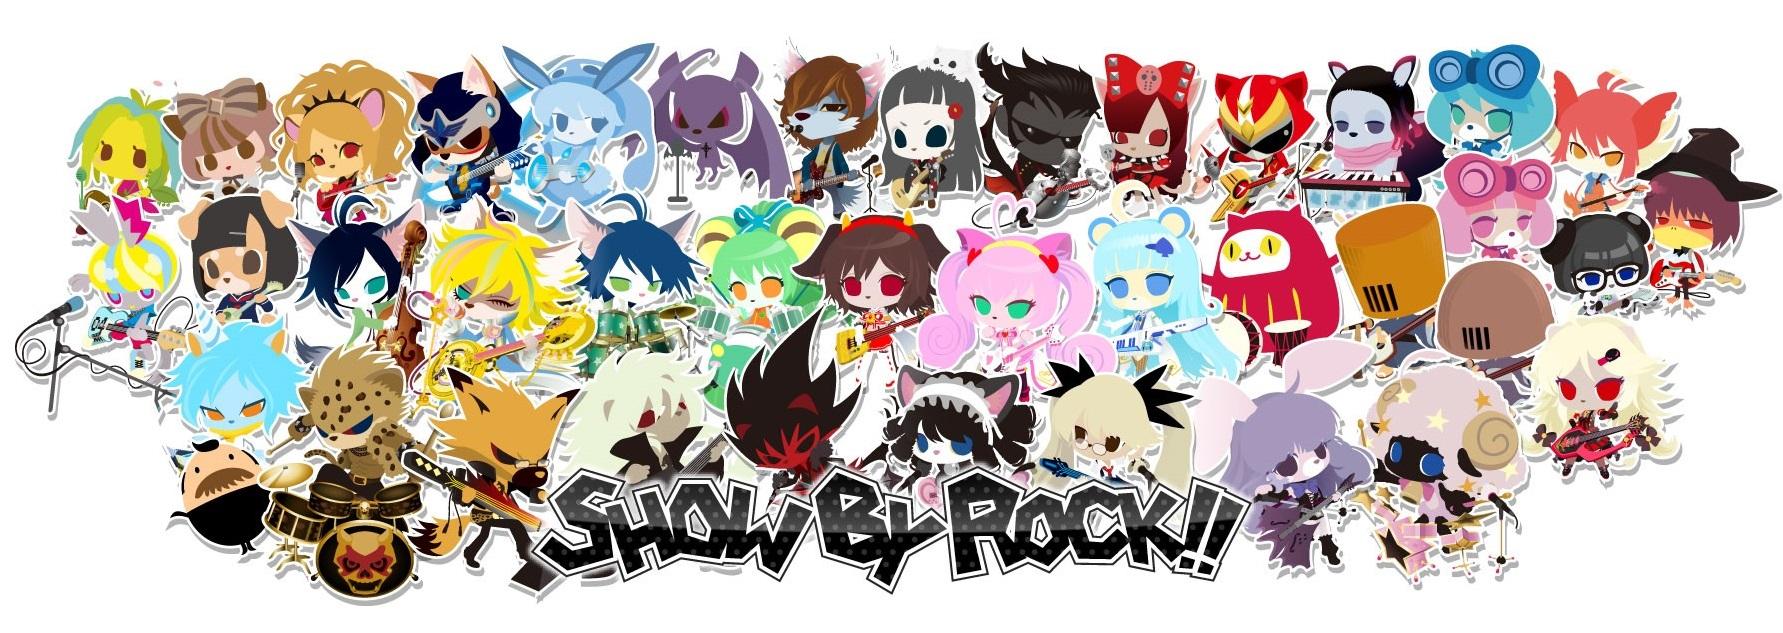 『SHOW BY ROCK!!』にタイアップアーティストの2楽曲が追加!